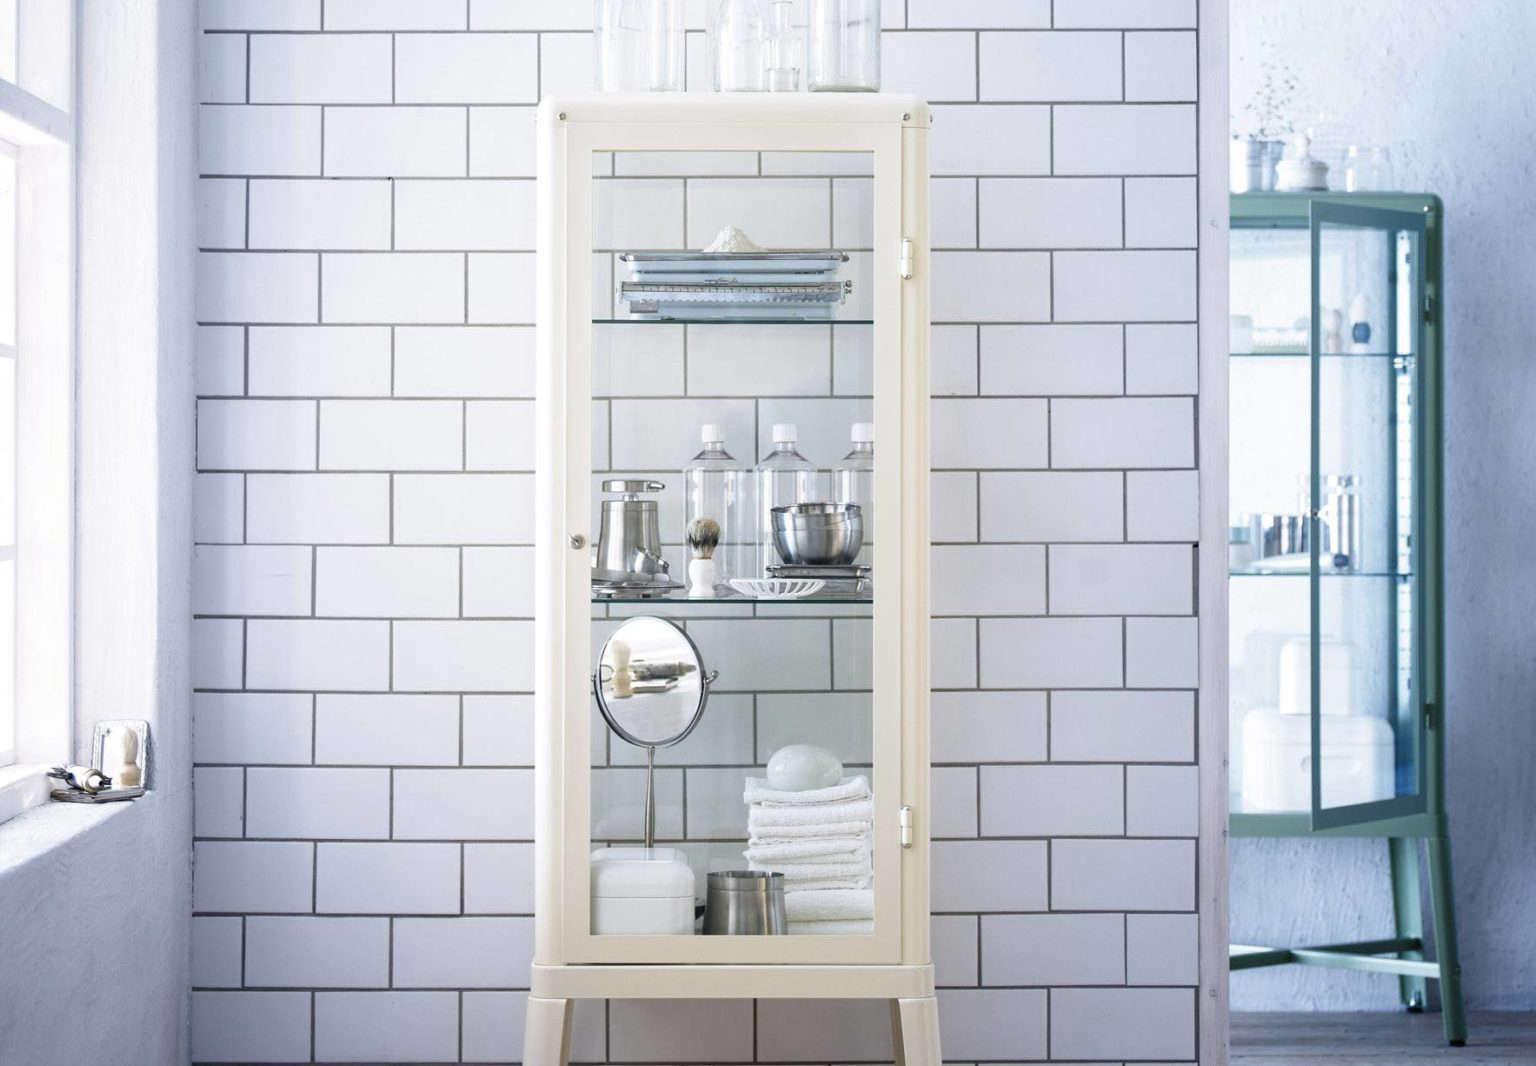 Ikea Fabrikor cabinets in a bathroom. Photo by Ikea.